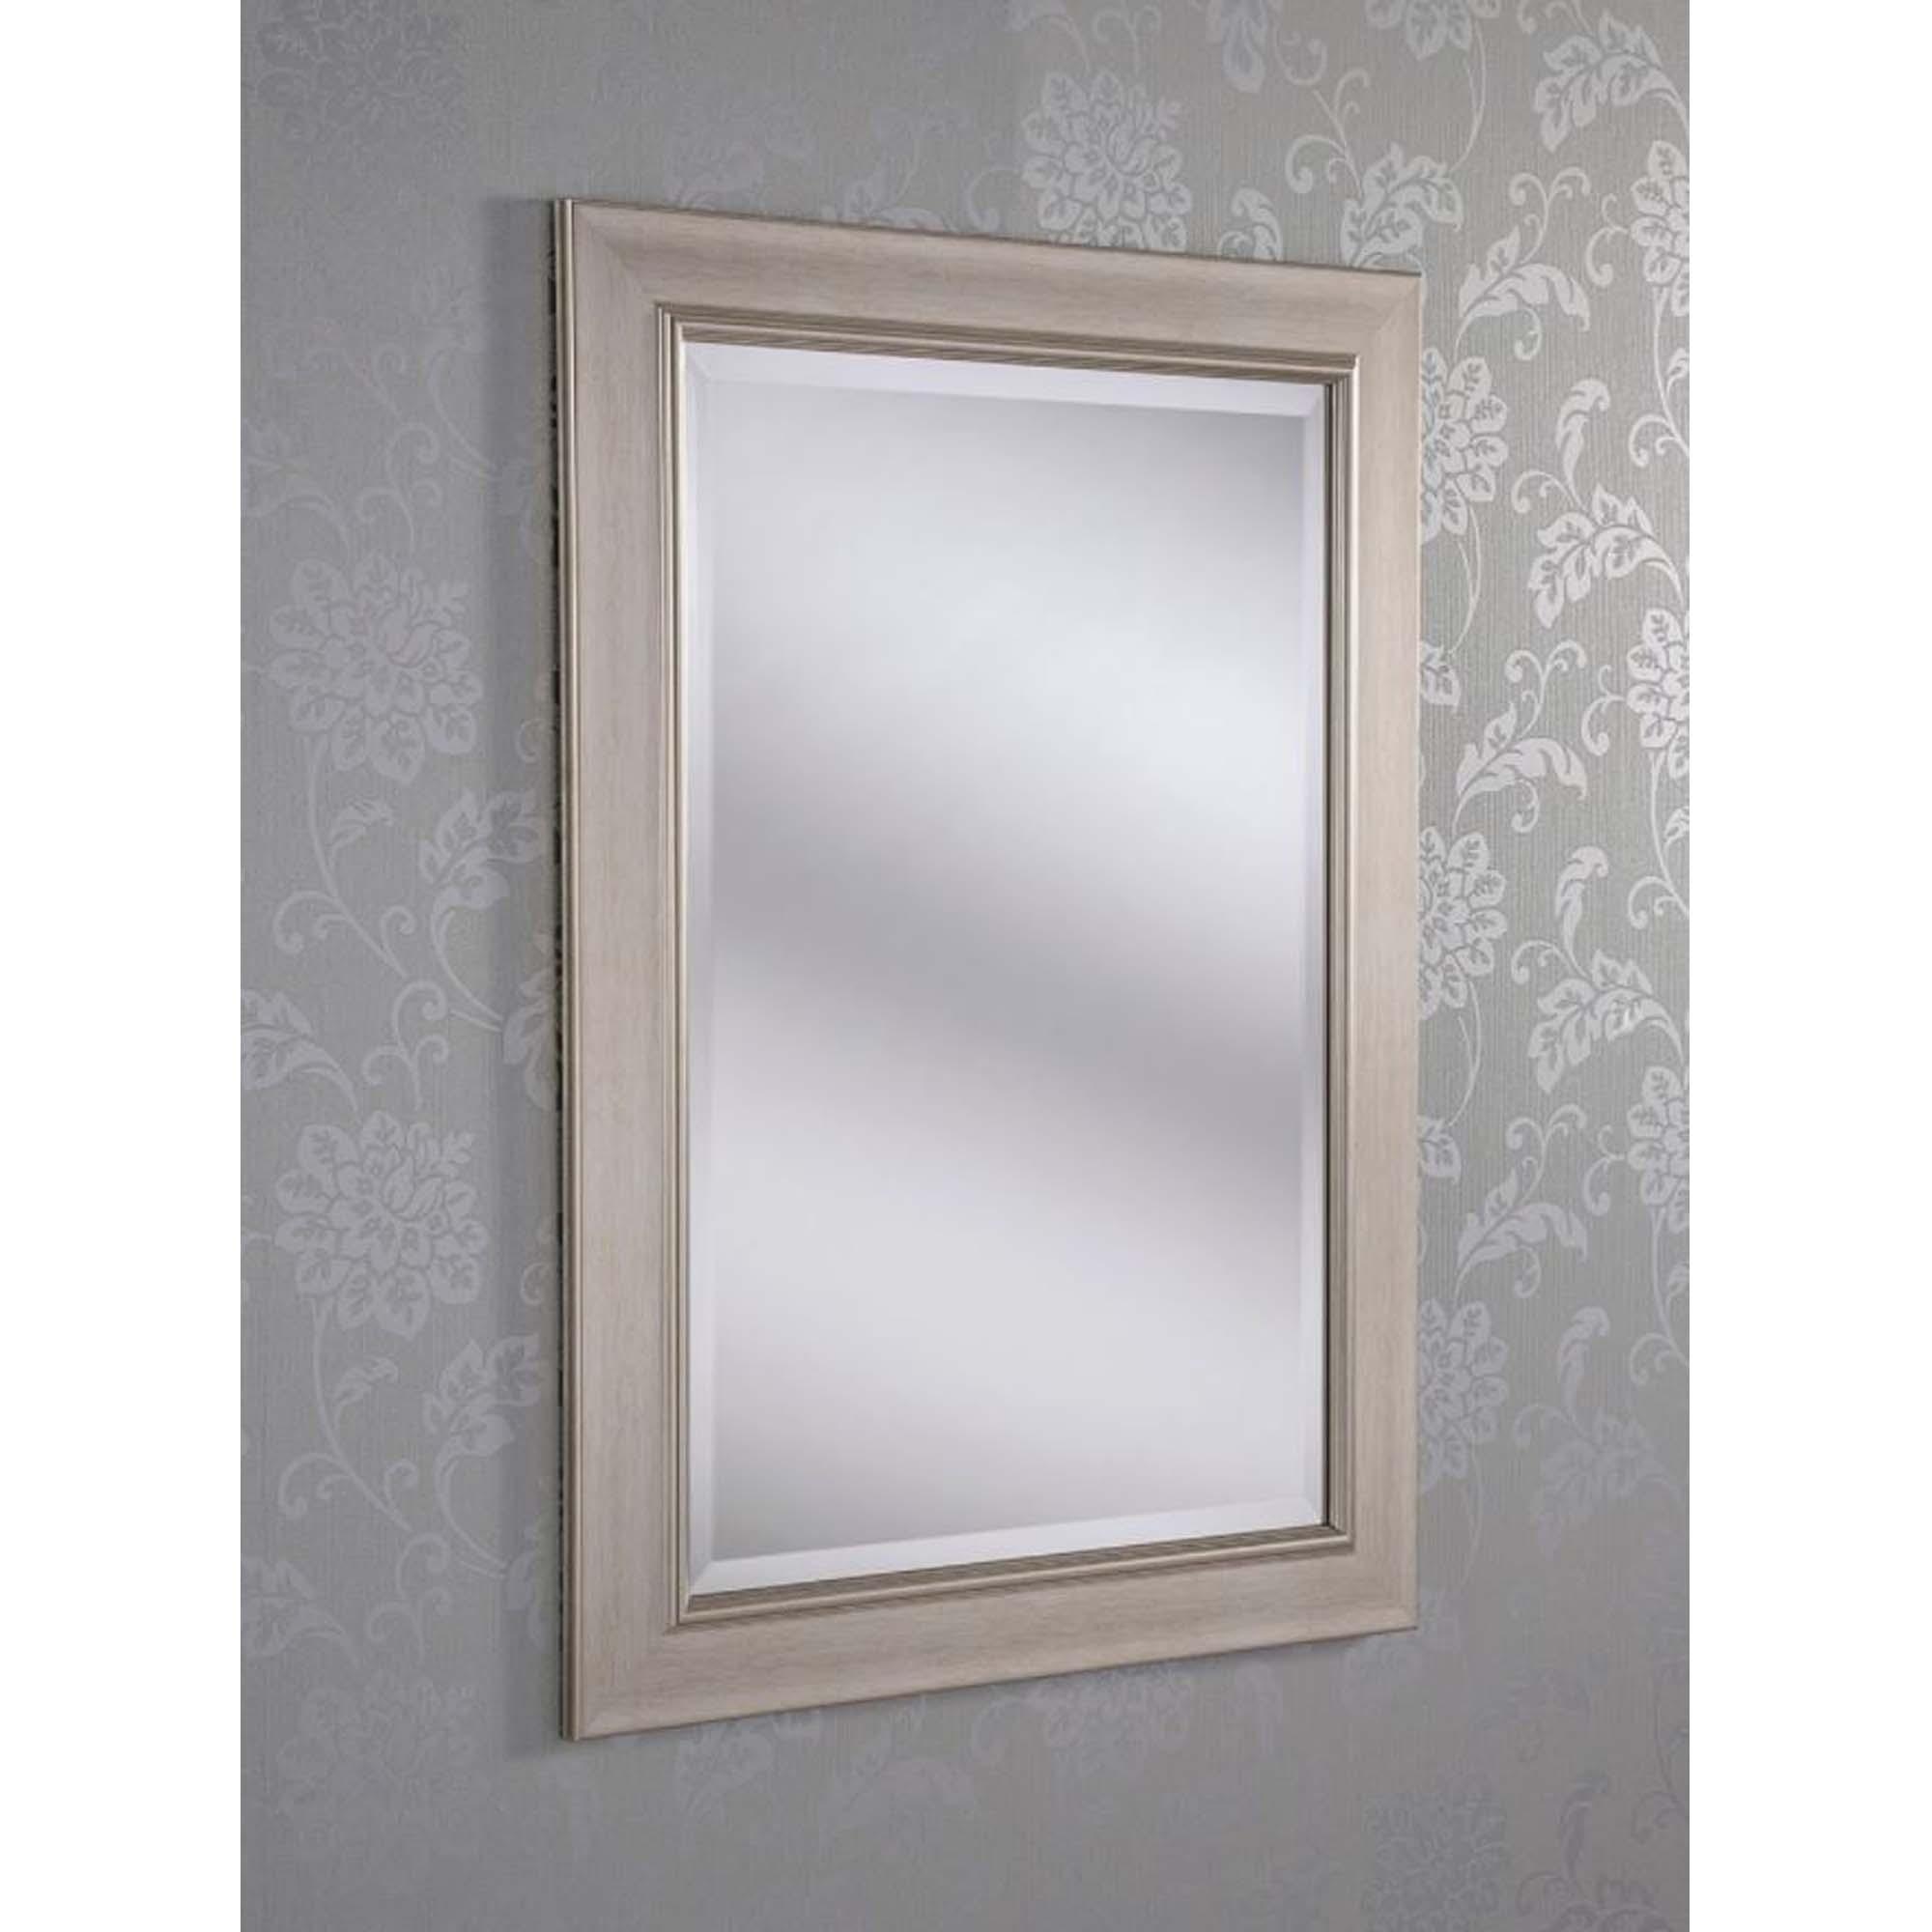 Decorative silver framed rectangular wall mirror